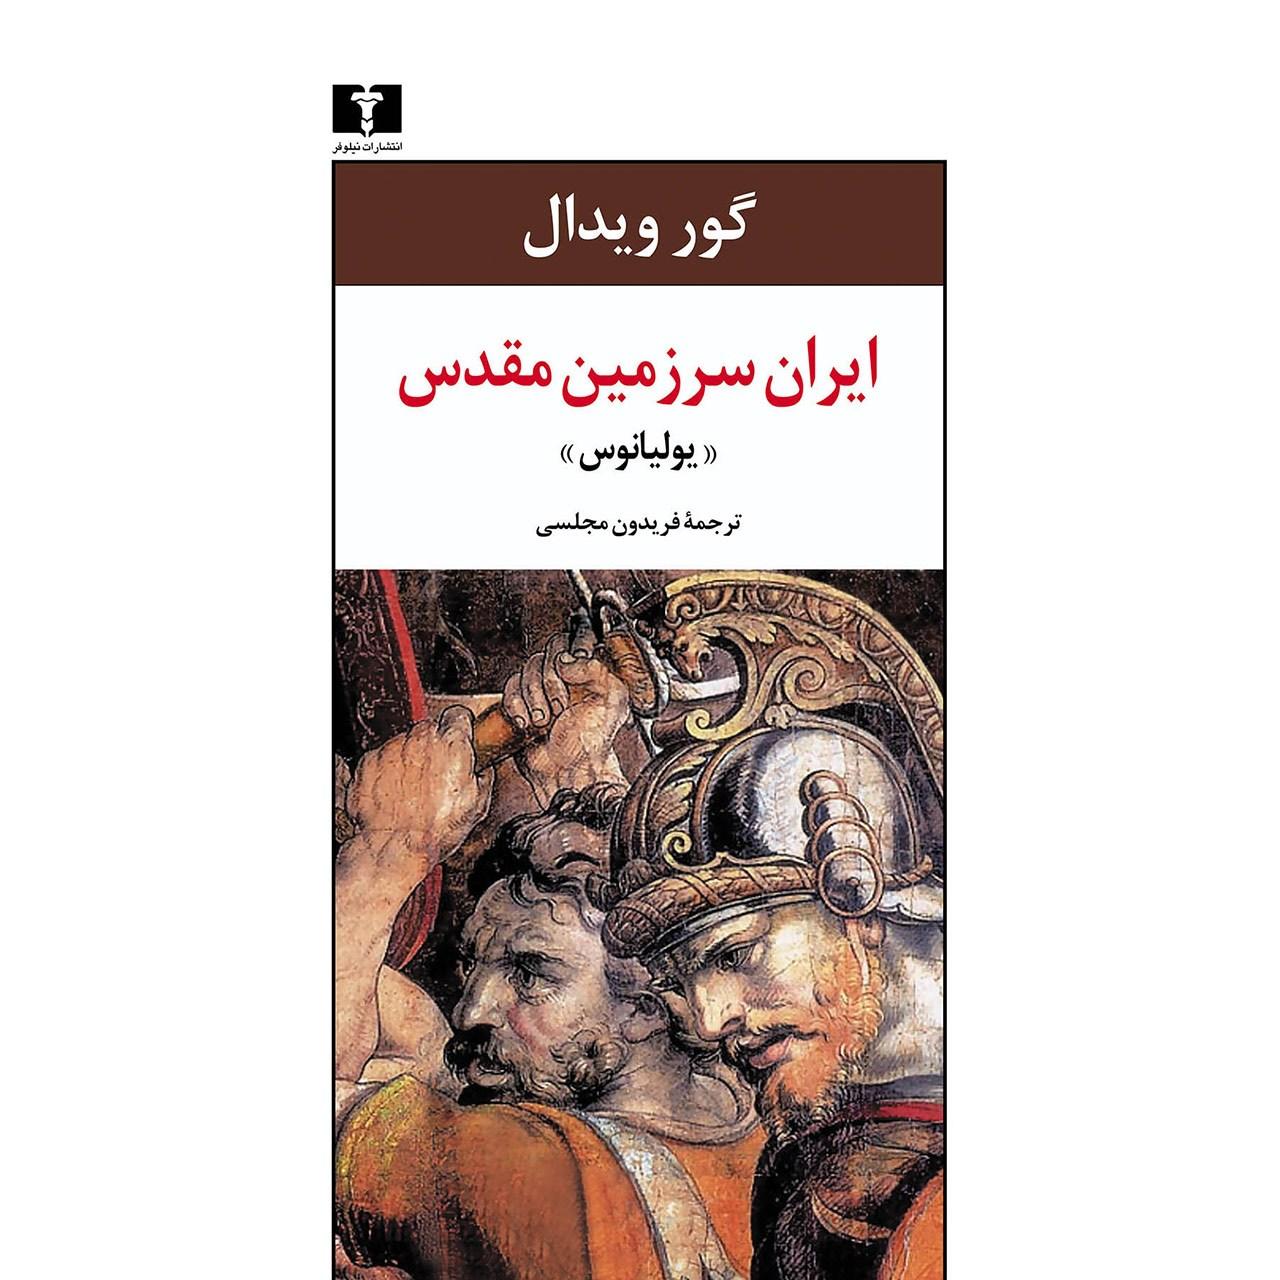 کتاب ایران سرزمین مقدس یولیانوس اثر گور ویدال